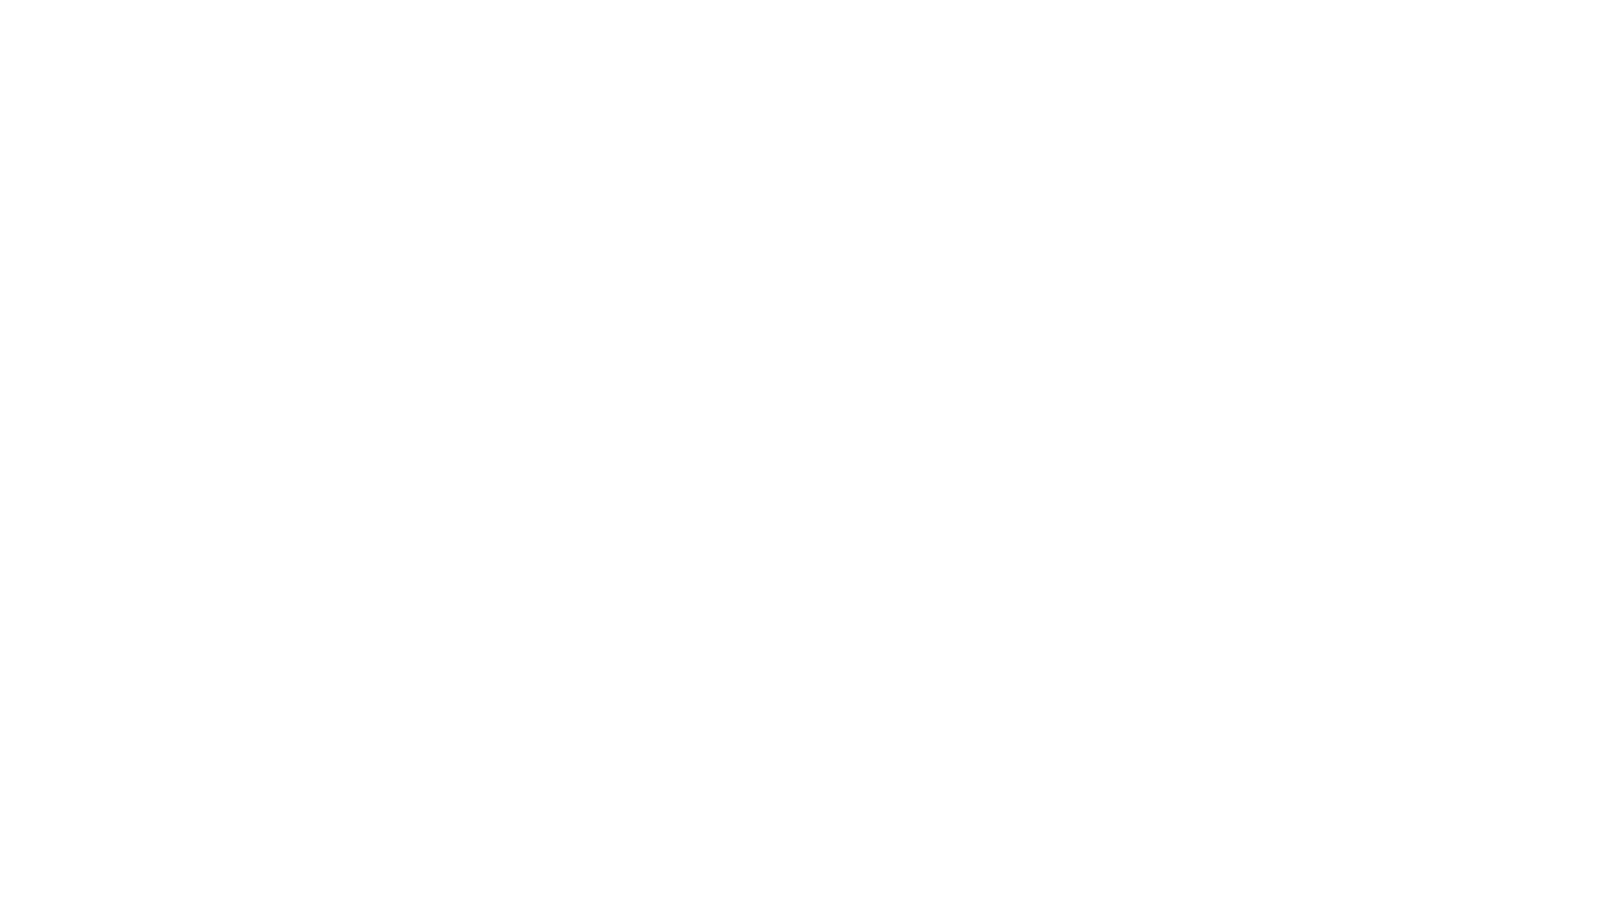 "Golden Point in association with AMRKS presents  Short Film   ROADS HAVE STORIES Happy Birth Day Lisa  Executive Producer Muhamed A. Krasniqi  Written Directed and Produced by Imer Veliu  Line Producer Anita Karaxhi Veliu  Organizer Gentiana Xheladini  Music Credits Pink Floyd Cast Lindita Kutllovci - English Teacher Elsa Mehanja - Lisa Nart Krasniqi - Guitarist Erion Hajdari - Guy 1 Engjëll Sedaj - Guy 2  Yllka Mulaku Enea Lajqi Trendelina Gashi Gerta Fetahu Olta Ymeri Dion Jetullahu Vlera Kelani Nexhat Begolli Vesa Berisha Kanita Kuqi Arianit Beqiri Diart Gashi Lueron Gërguri Lorik Gërguri Rron Haxhiu Avni Selmani Orhidea Shemsedini Jon Kutllovci Rinarda Lahu Eris Borovci Elmedina Jashari Tringa Pasoma Leontina Musa Blenda Qunaku Eriona Imeri      Thanks to:  College of Applied Technical Sciences ""Tempulli"" Institute for Road Safety and Transport Research Kosovo Forum for Road Safety Ministry of Infrastructure Kosovo Police Urgent Medicine Center in Prishtina Primary and Middle Secondary School ""Dardania"" in Prishtina Director of School Mr. Isak Bregaj  Teacher and Students from Class 9/1   AMRKS All Rights Reserved ®"